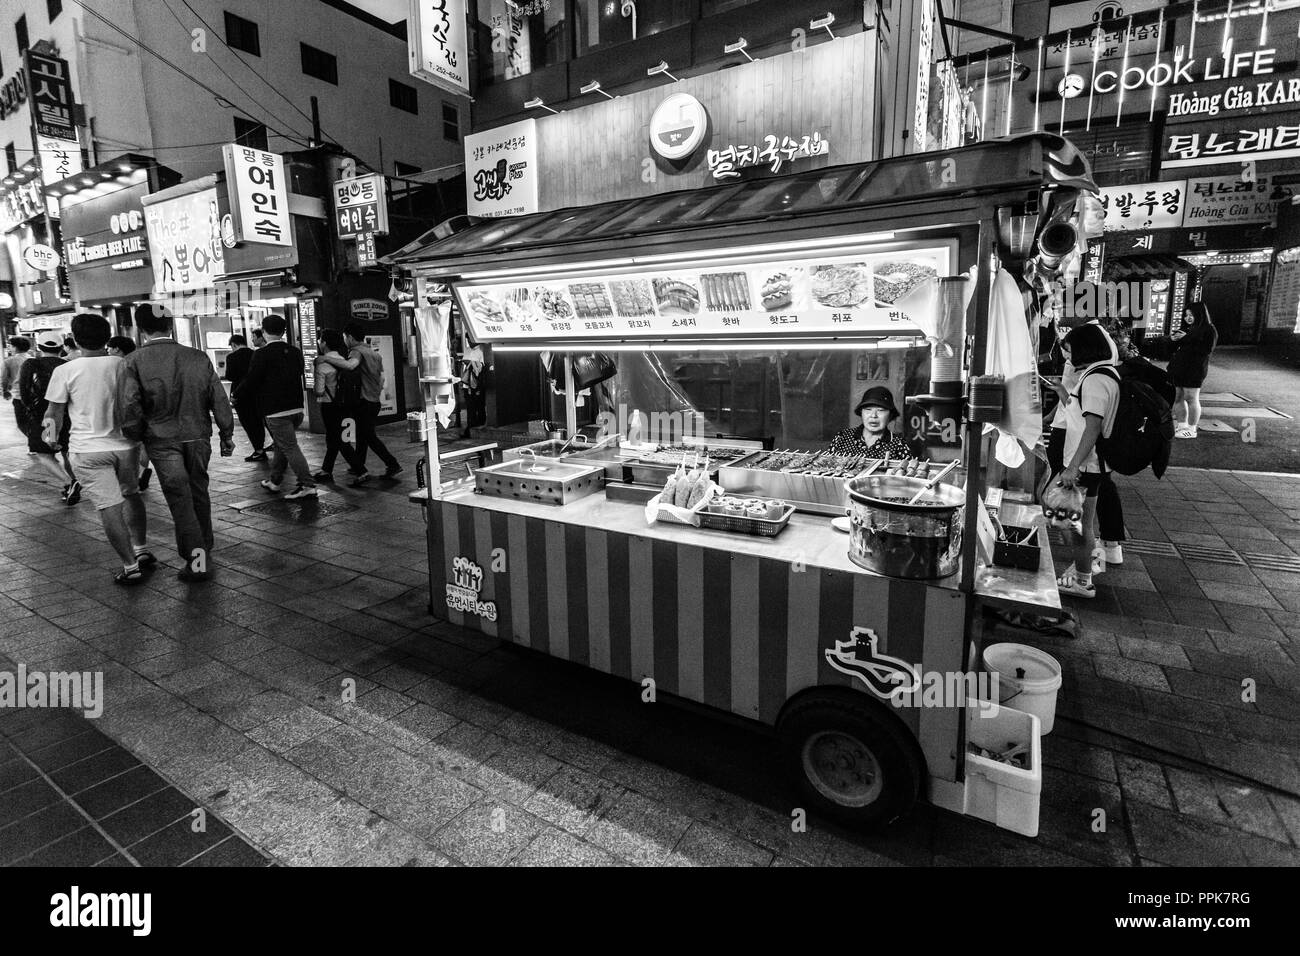 Suwon, South Korea - June 14, 2017: Vendor woman waiting of buyers in her fast food kiosk at main street in Suwon. - Stock Image